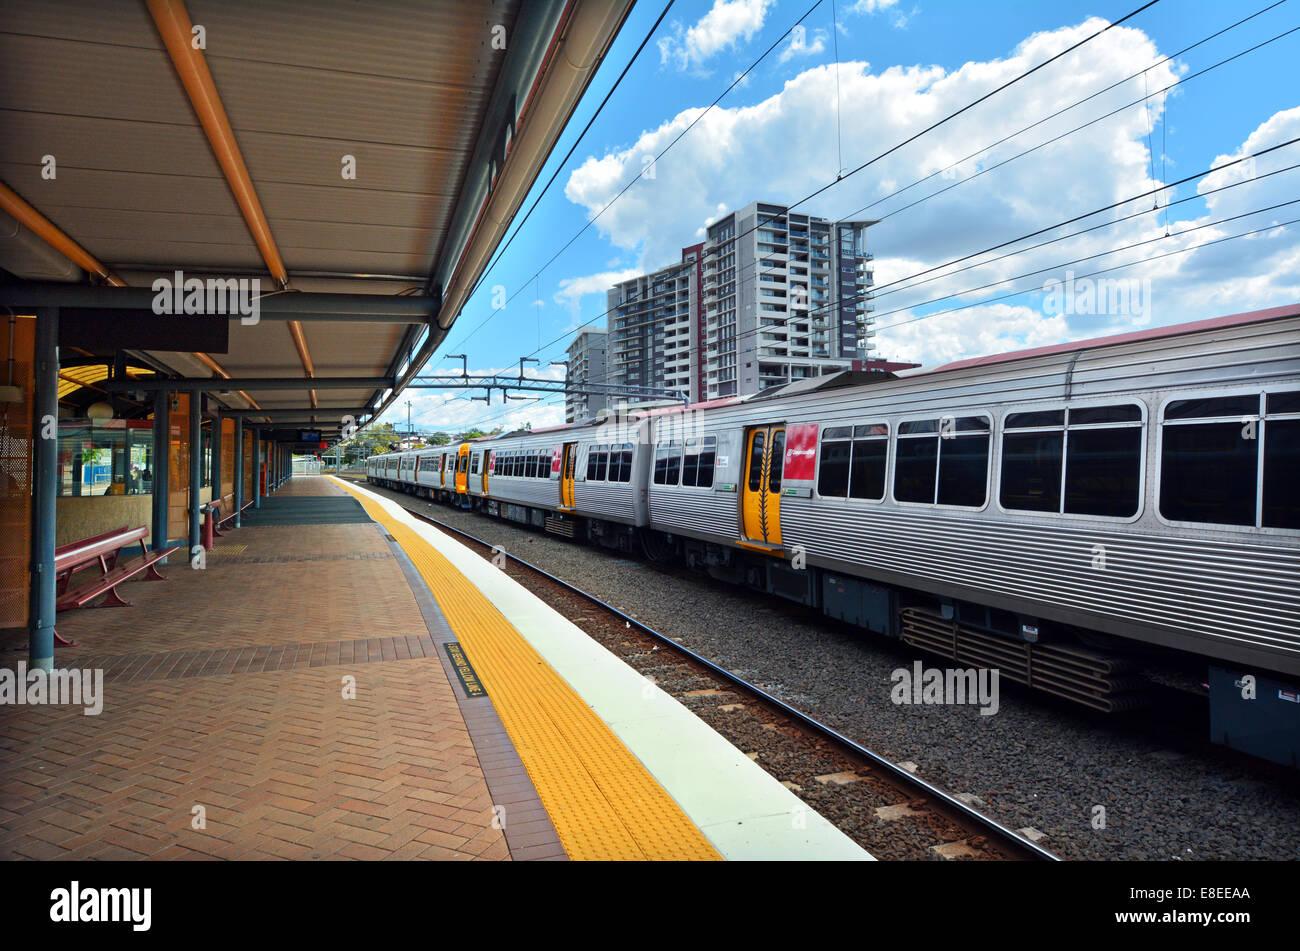 Queensland Rail in Roma Street railway station in Brisbane, Queensland, Australia Stock Photo